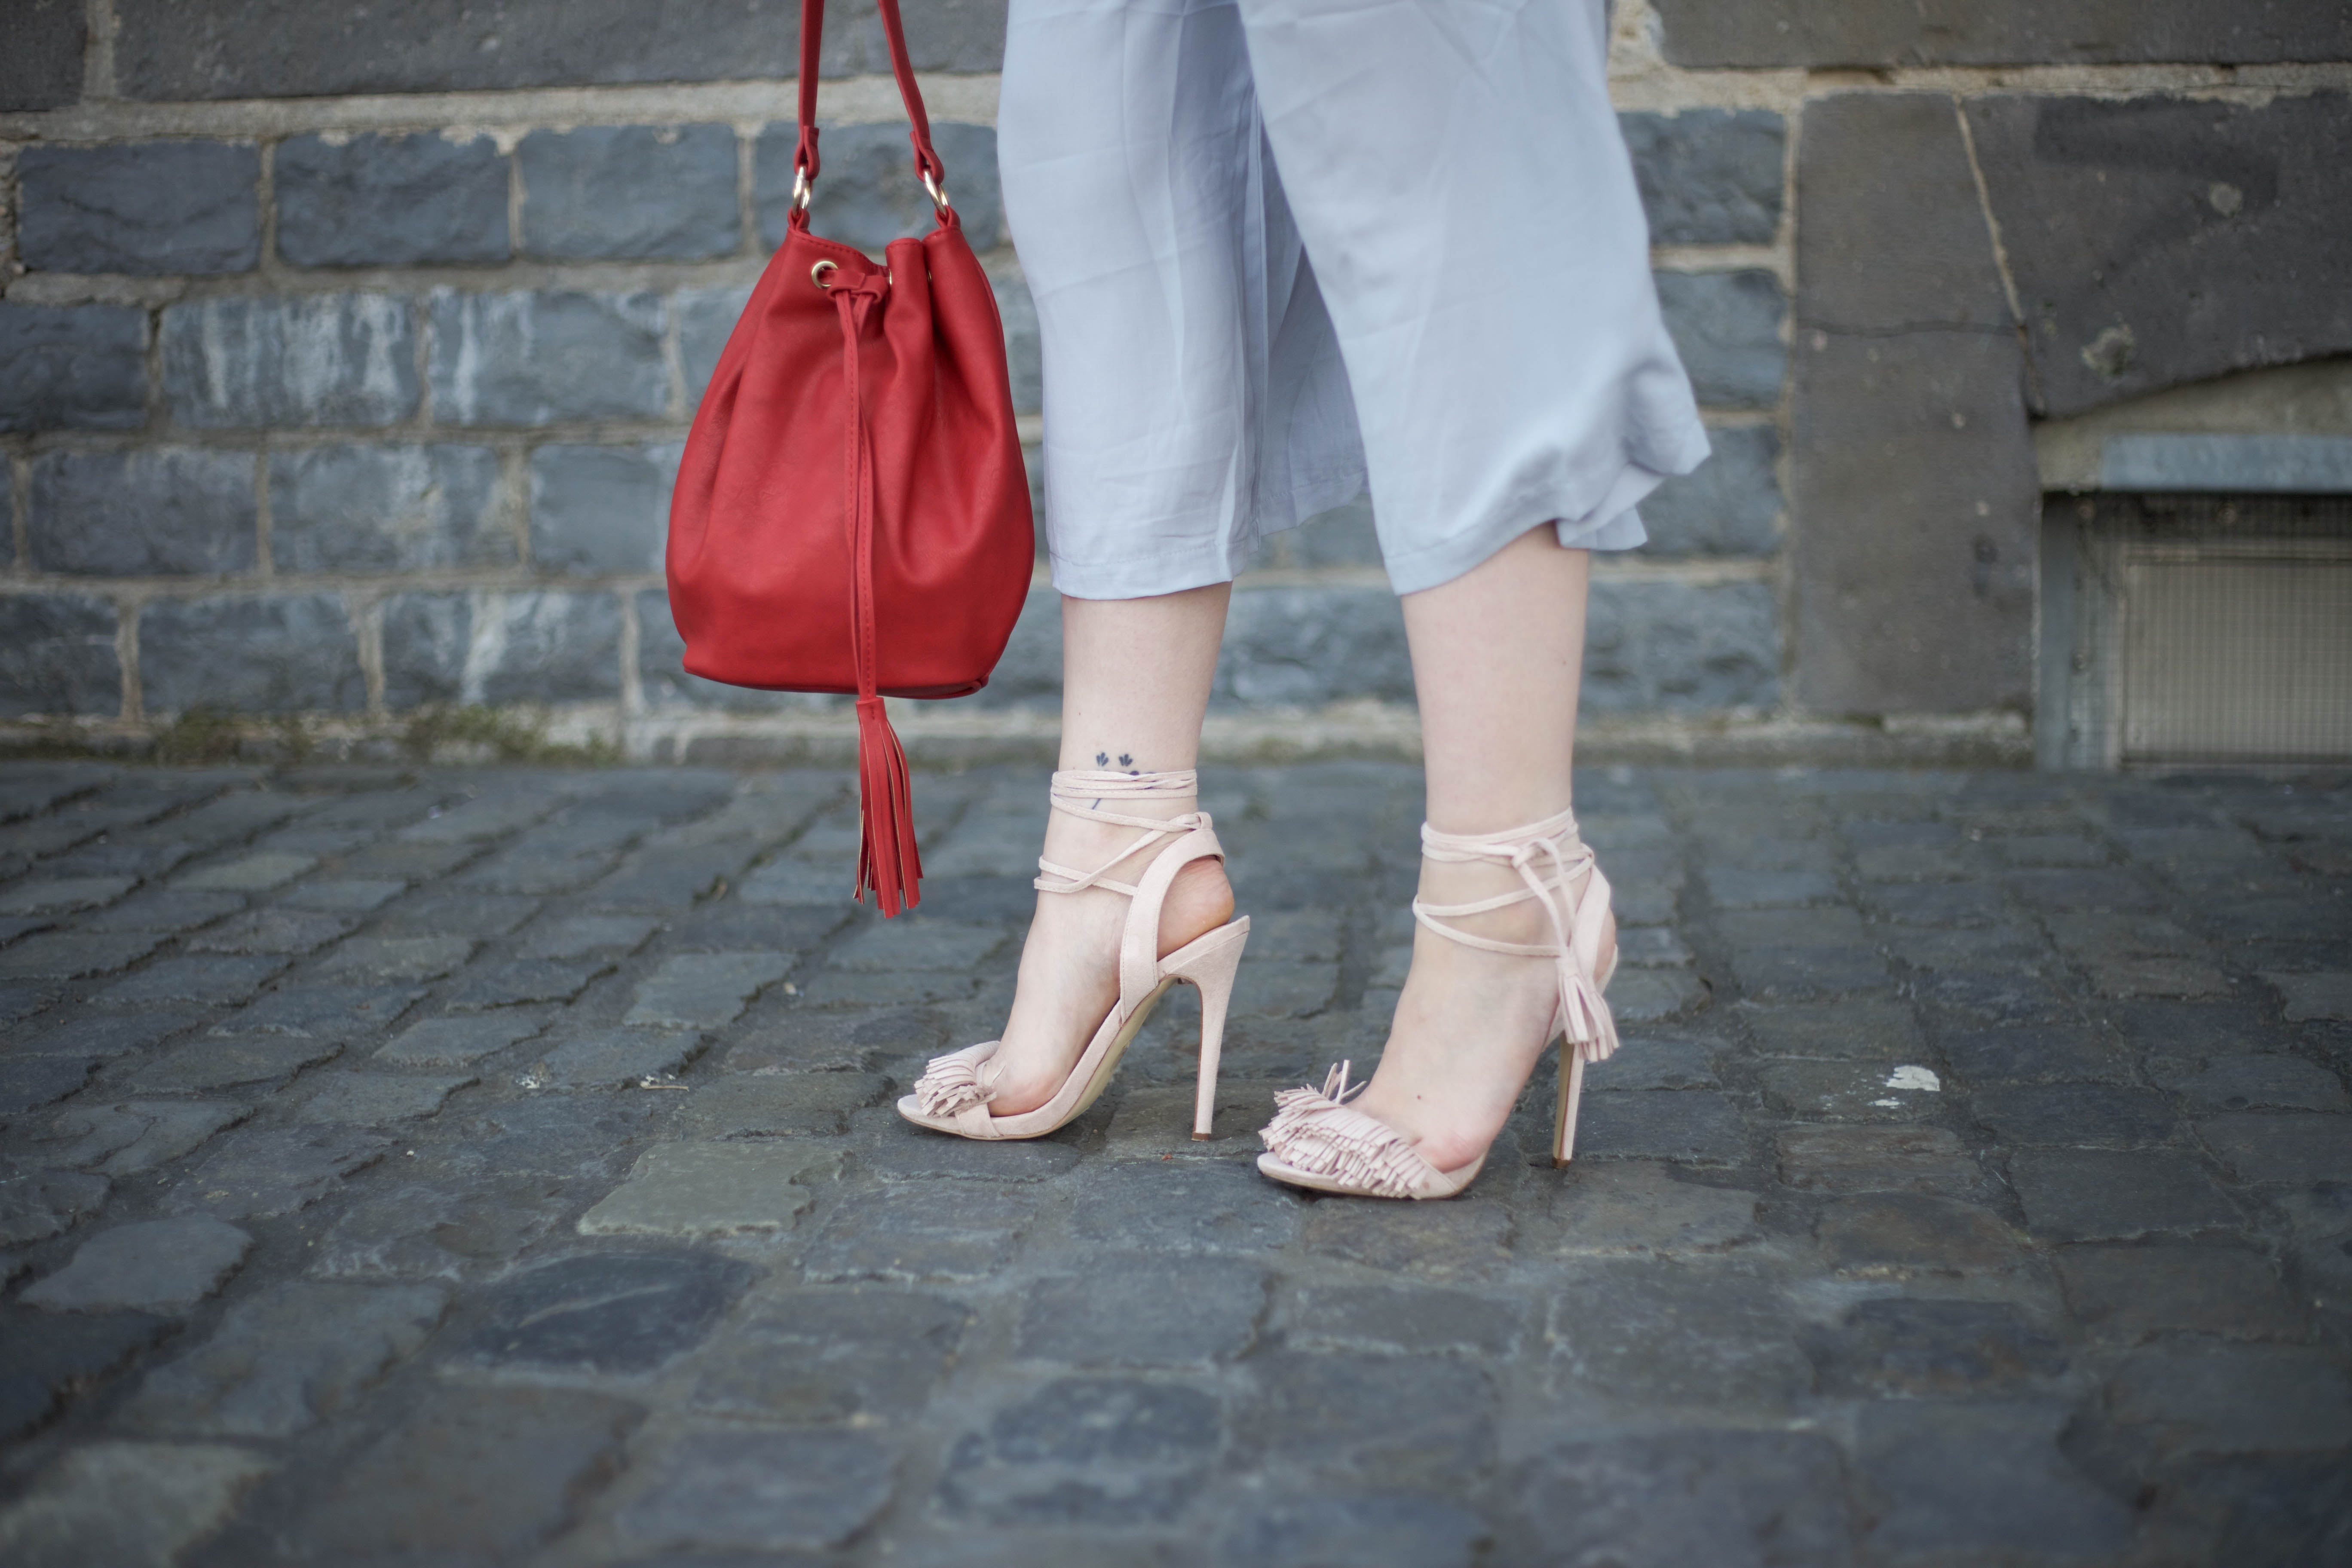 justfab modeblog berlin köln ootd fashion outfit jumpsuit overall_9772